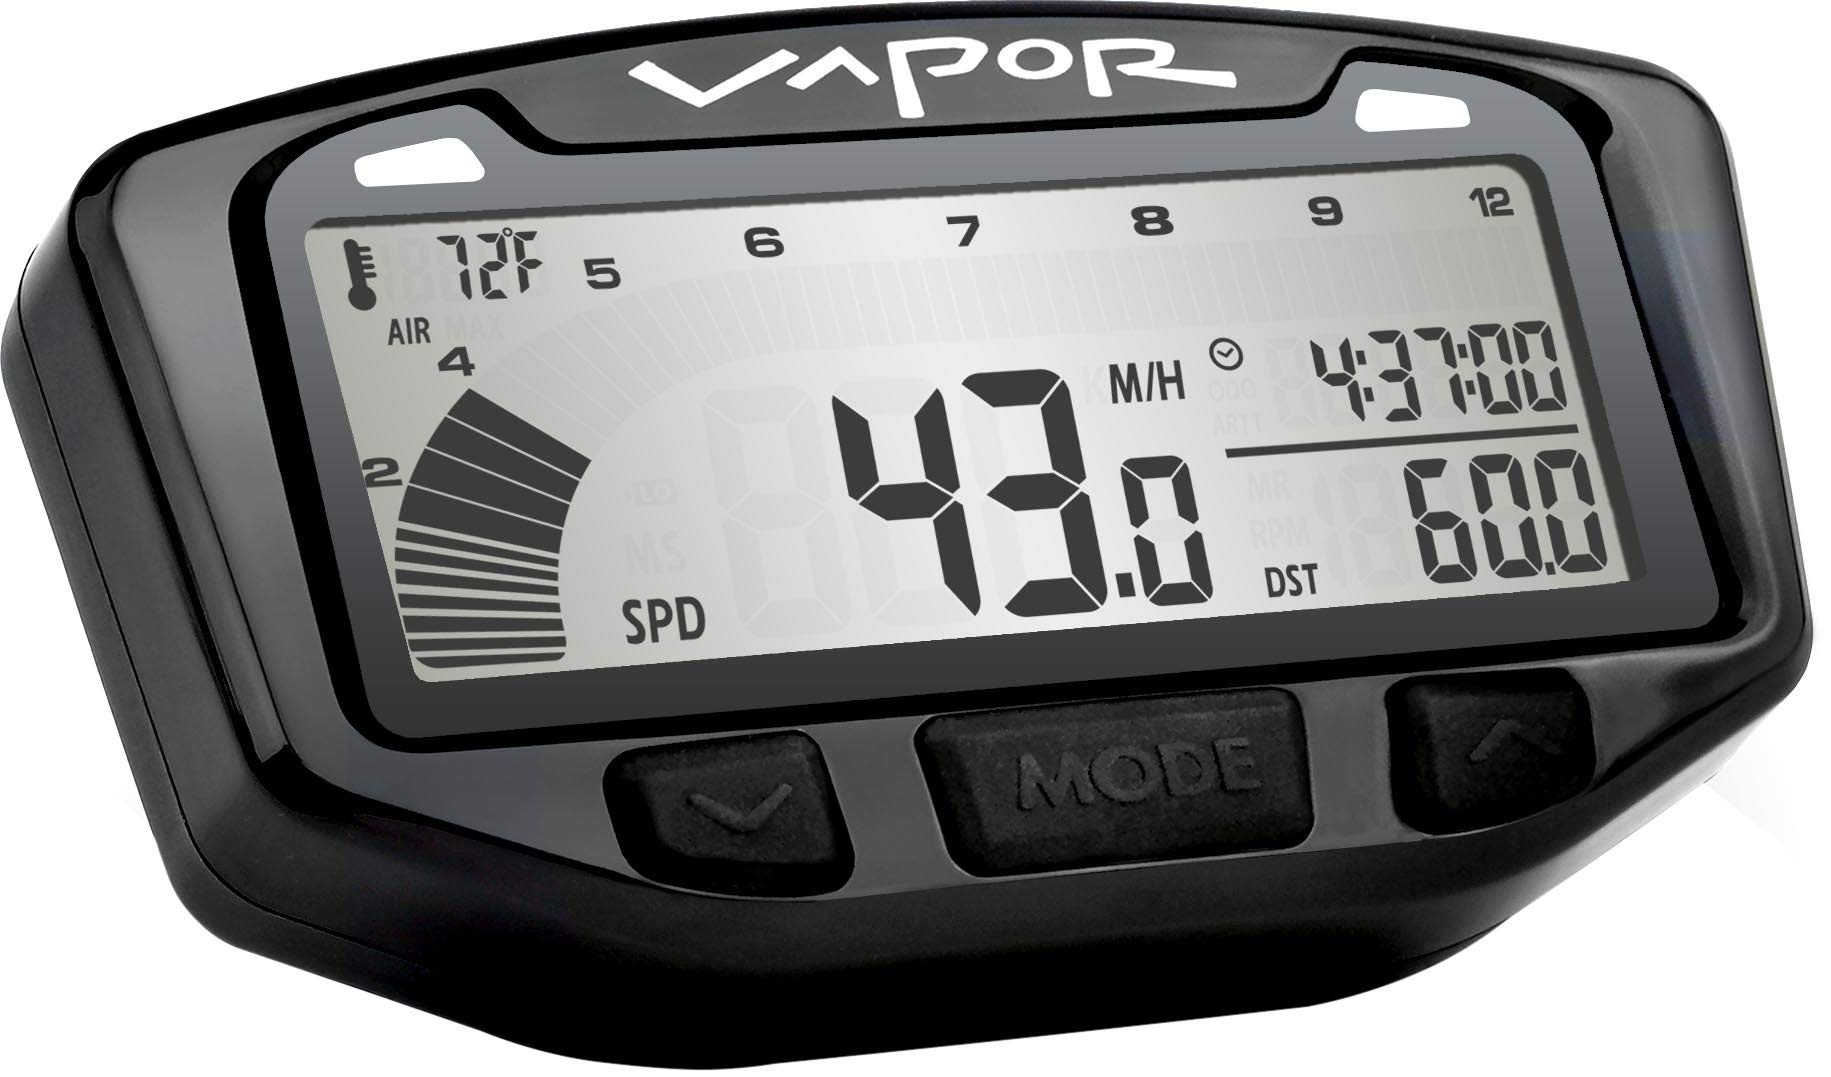 Trail Tech 752-120 Black Vapor Digital Speedometer Tachometer Gauge Kit, 1985-2013 Polaris Trail Blazer Boss by Trail Tech